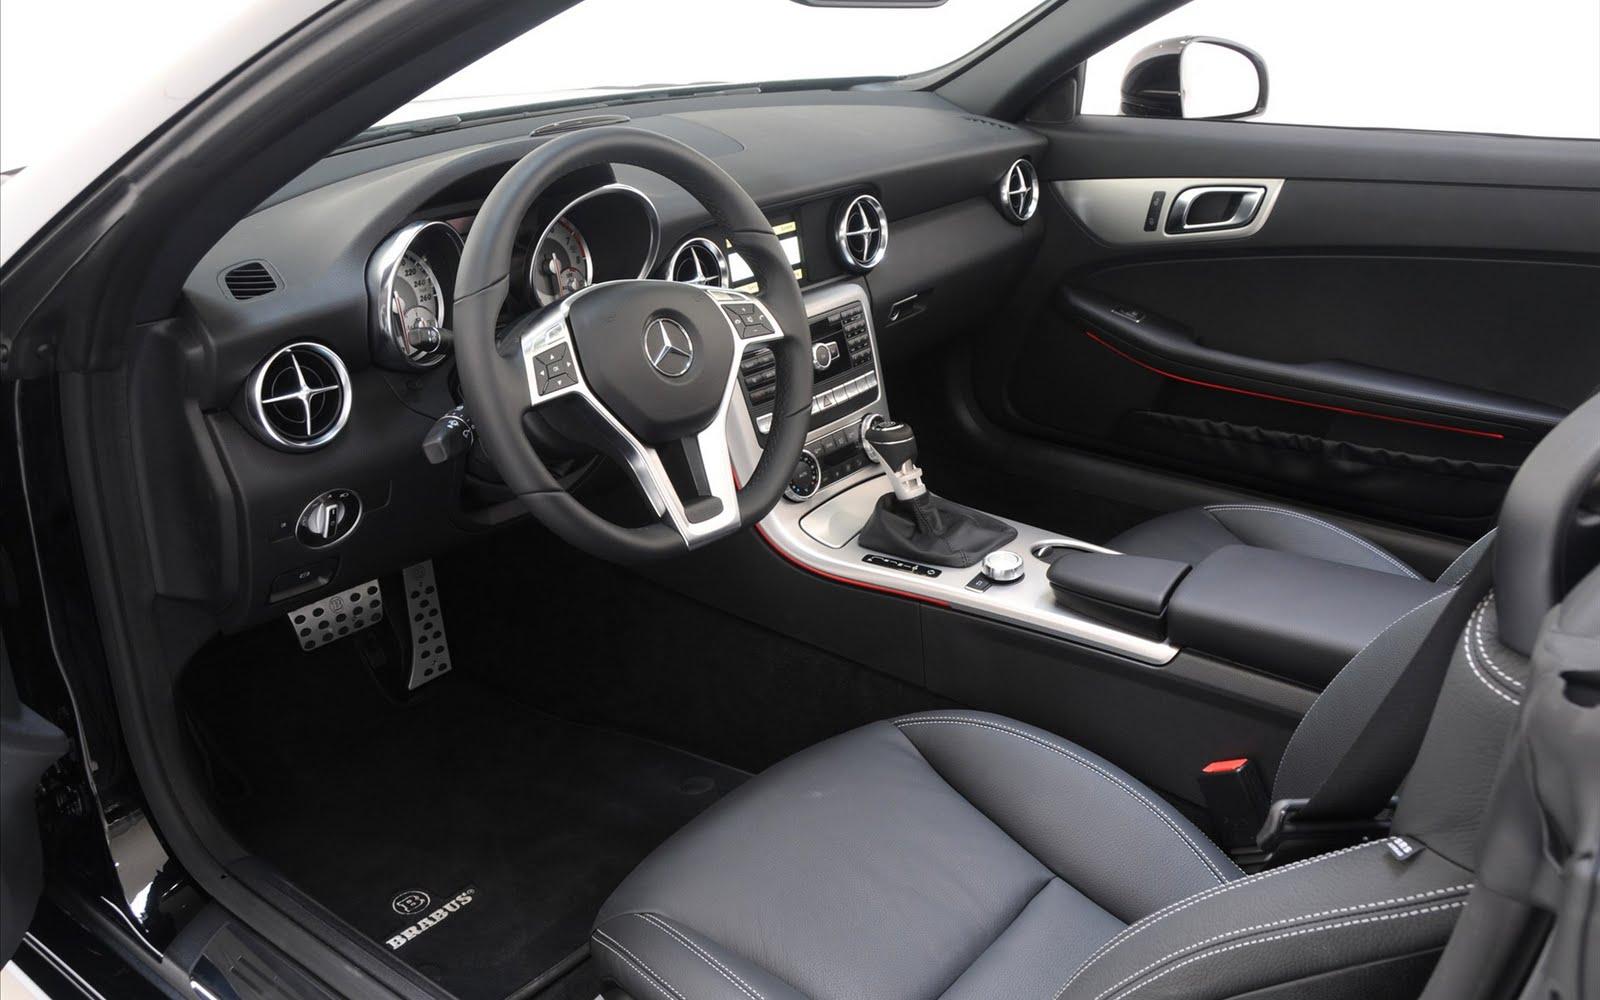 http://2.bp.blogspot.com/-60-ir60hS9w/Tj03W2KzajI/AAAAAAAAAY4/ode1FevGB7A/s1600/BRABUS-Mercedes-SLK-2011-widescreen-11.jpg